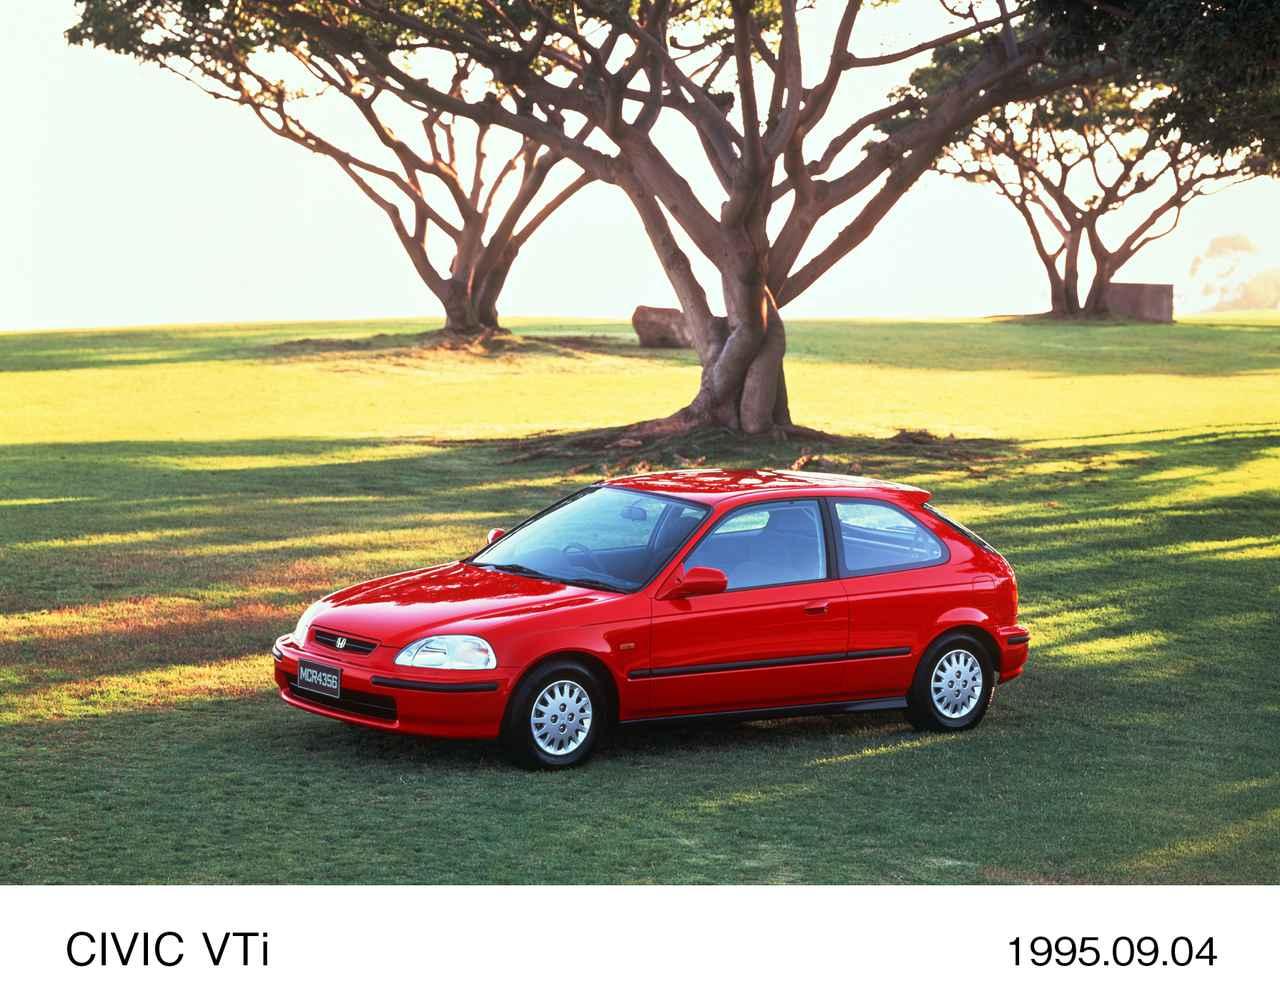 Images : 9番目の画像 - ホンダマチック関連の画像はこちら(クリックして拡大) - A Little Honda | ア・リトル・ホンダ(リトホン)